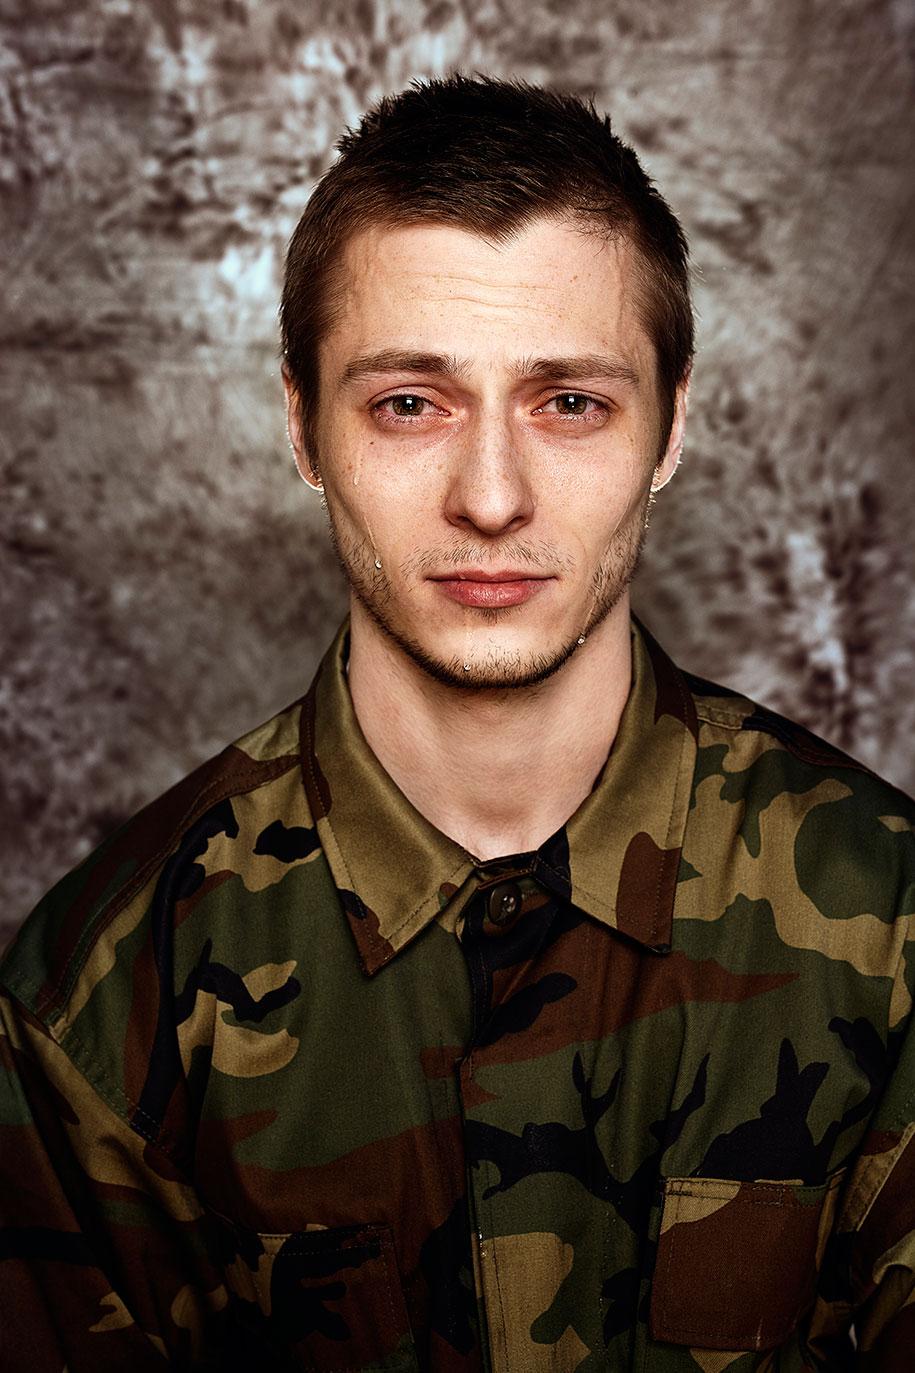 lithuanian-draft-conscription-men-portraits-neringa-rekasiute-beata-tiskevic-hasanova-6